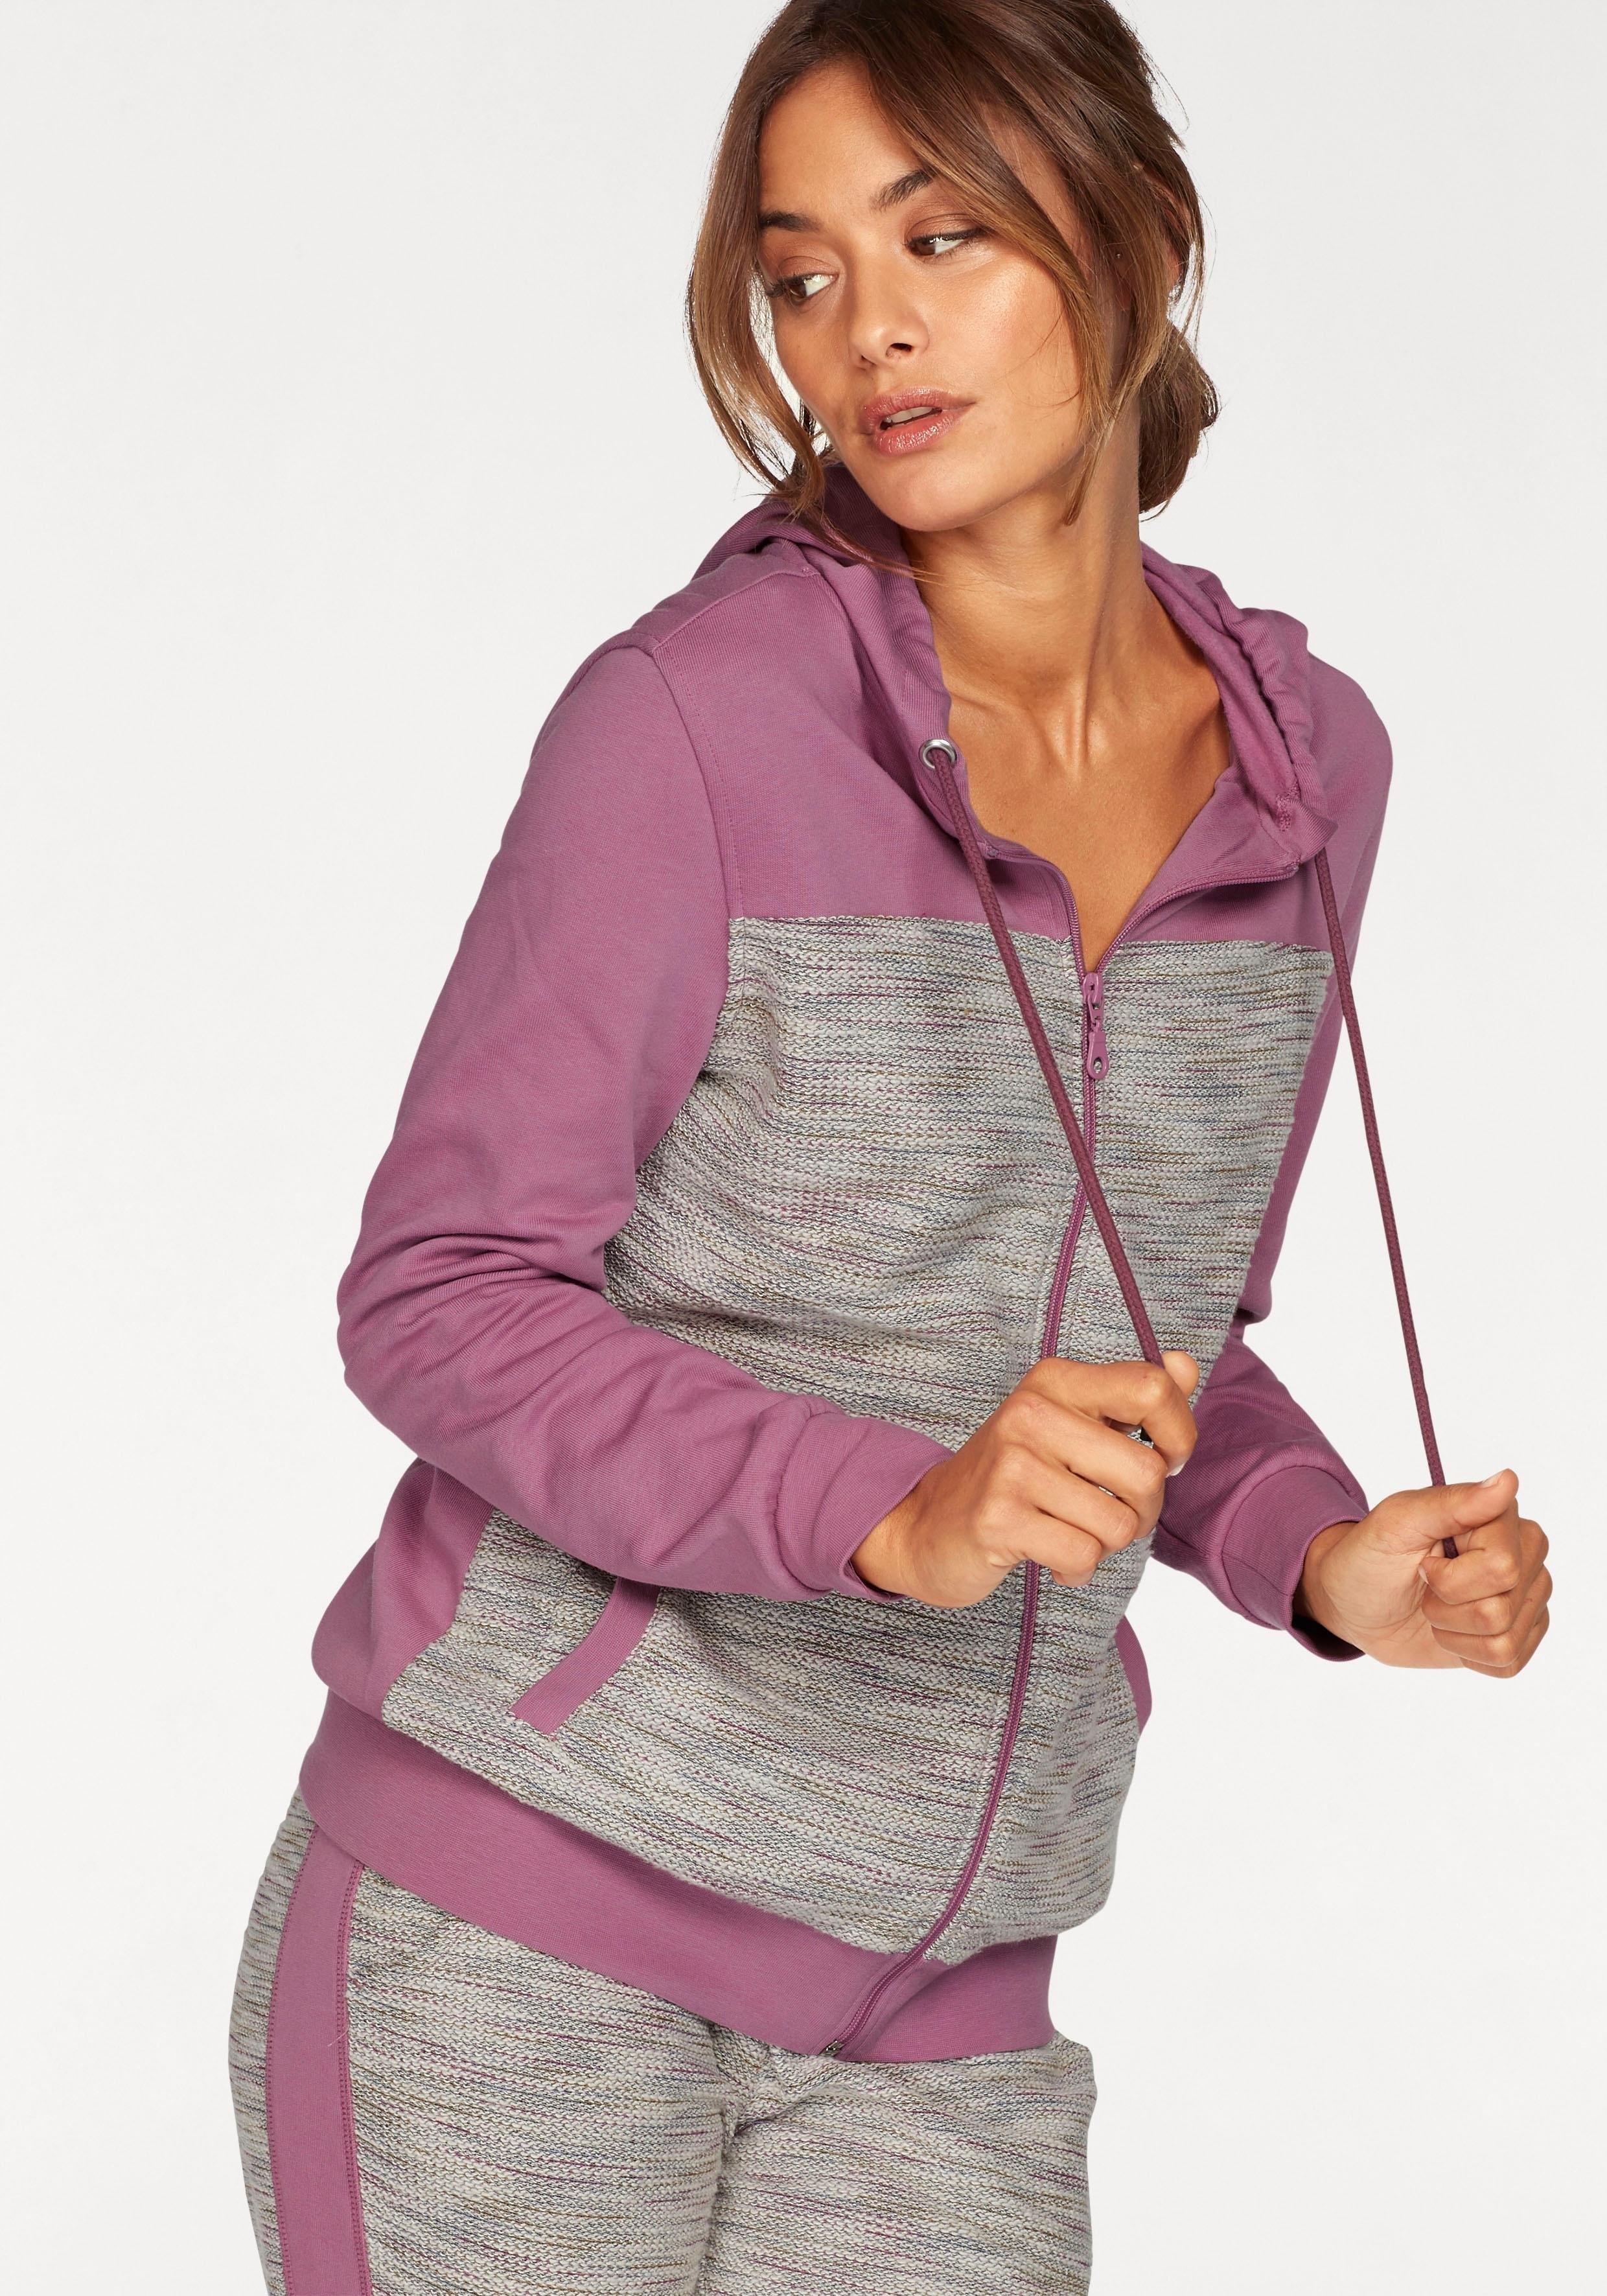 Op zoek naar een Buffalo homewear-jasje in moderne mêlee-look en materialenmix? Koop online bij Lascana